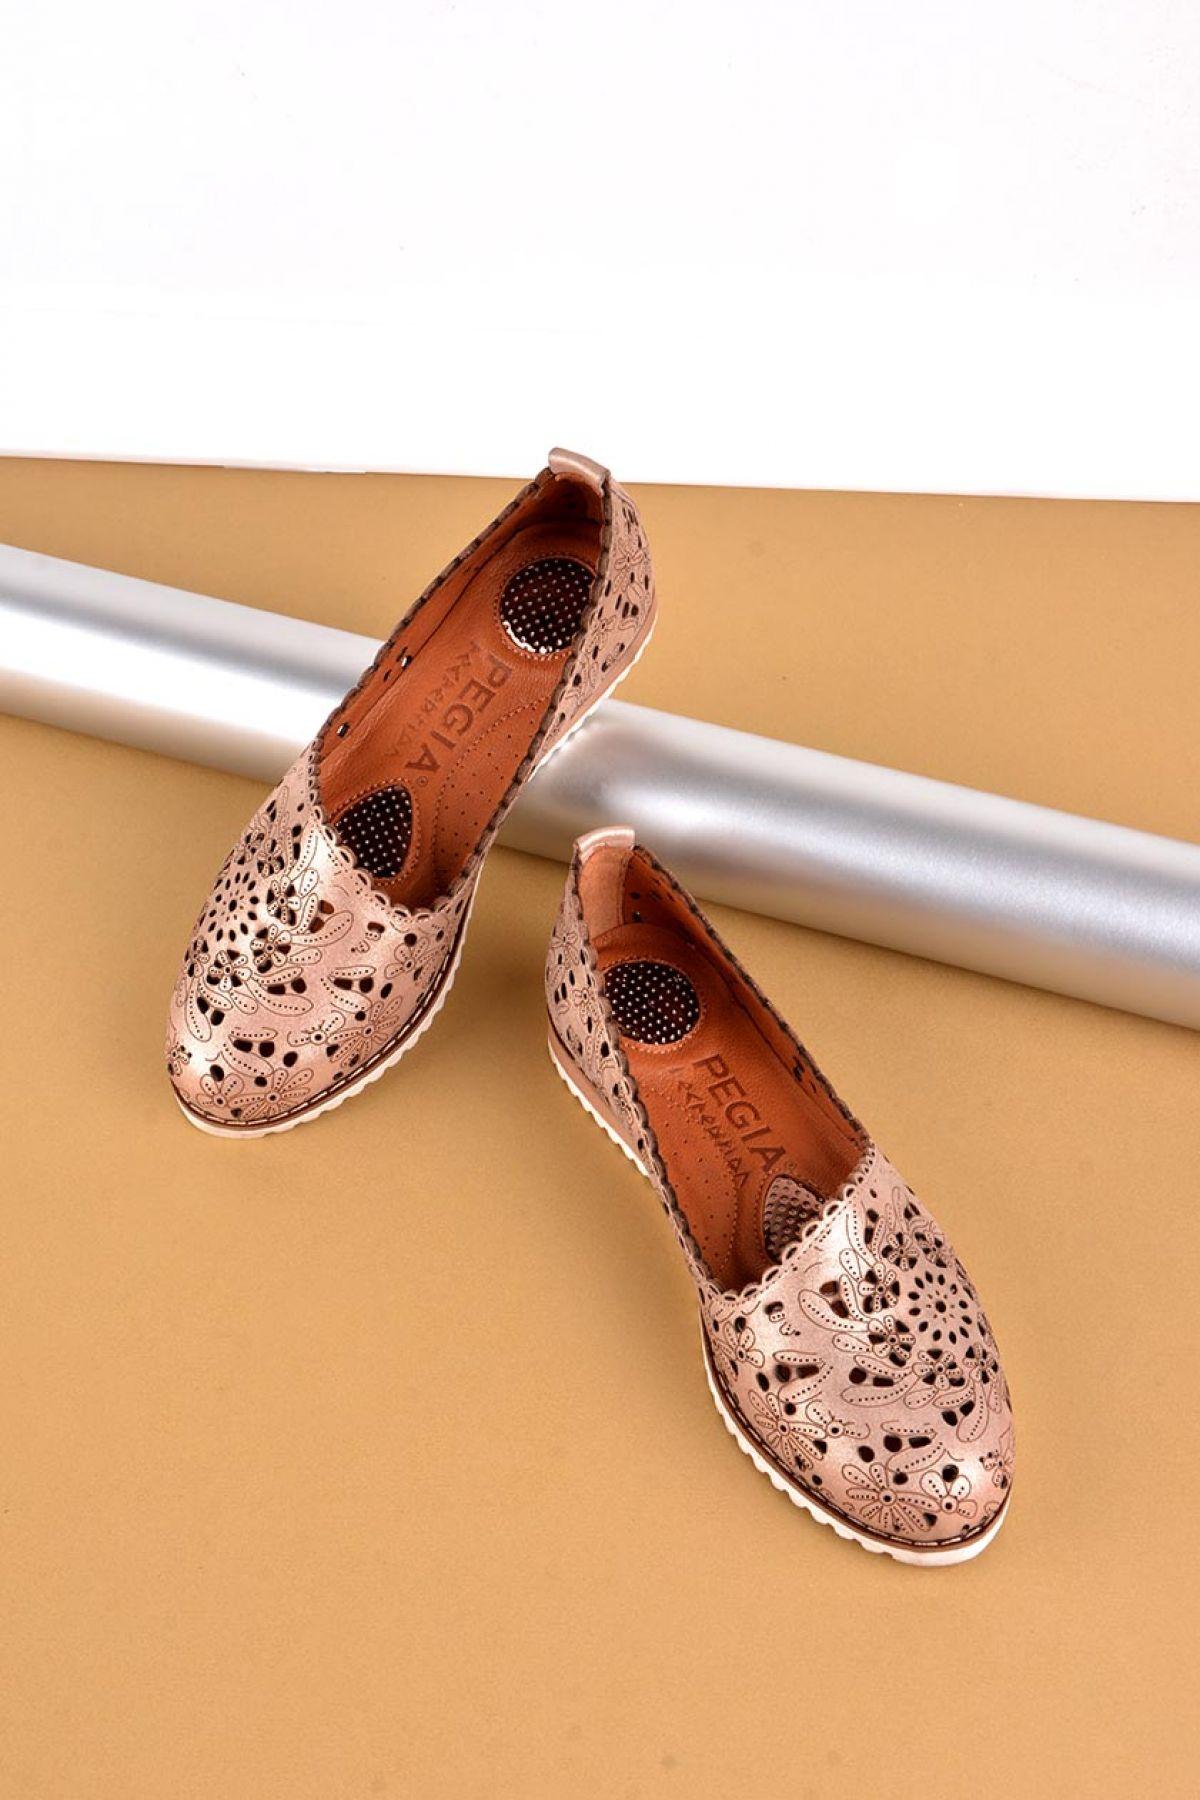 Pegia Hakiki Deri Bayan Ayakkabı REC-141 Bronz